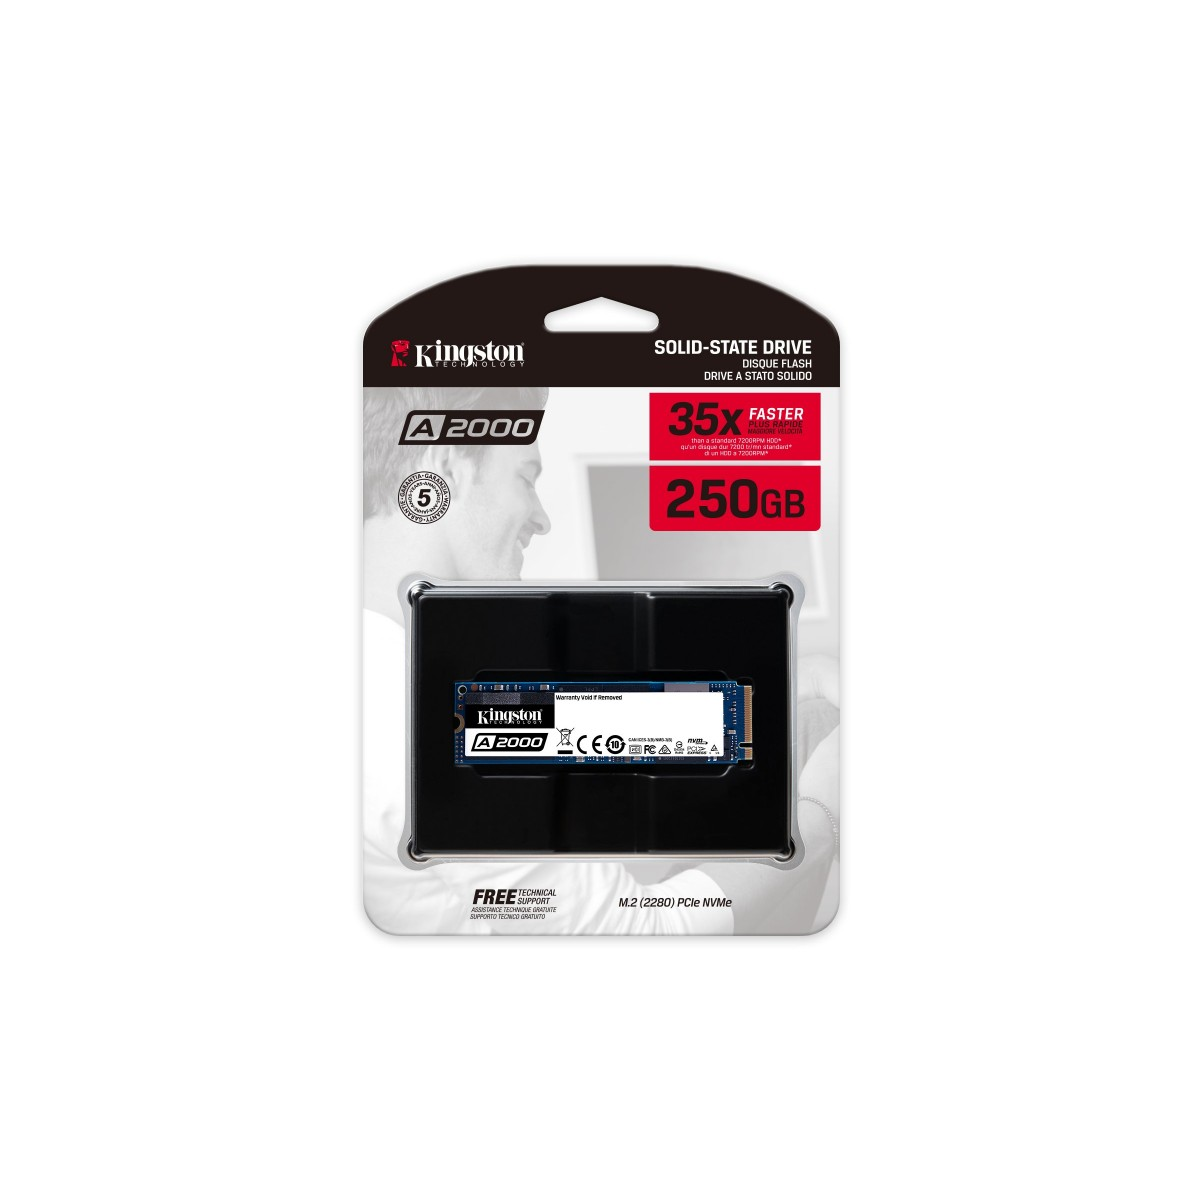 SSD Kingston A2000, 250GB, M.2 NVMe, Leitura 2200MBs e Gravação 2000MBs, SA2000M8/250G